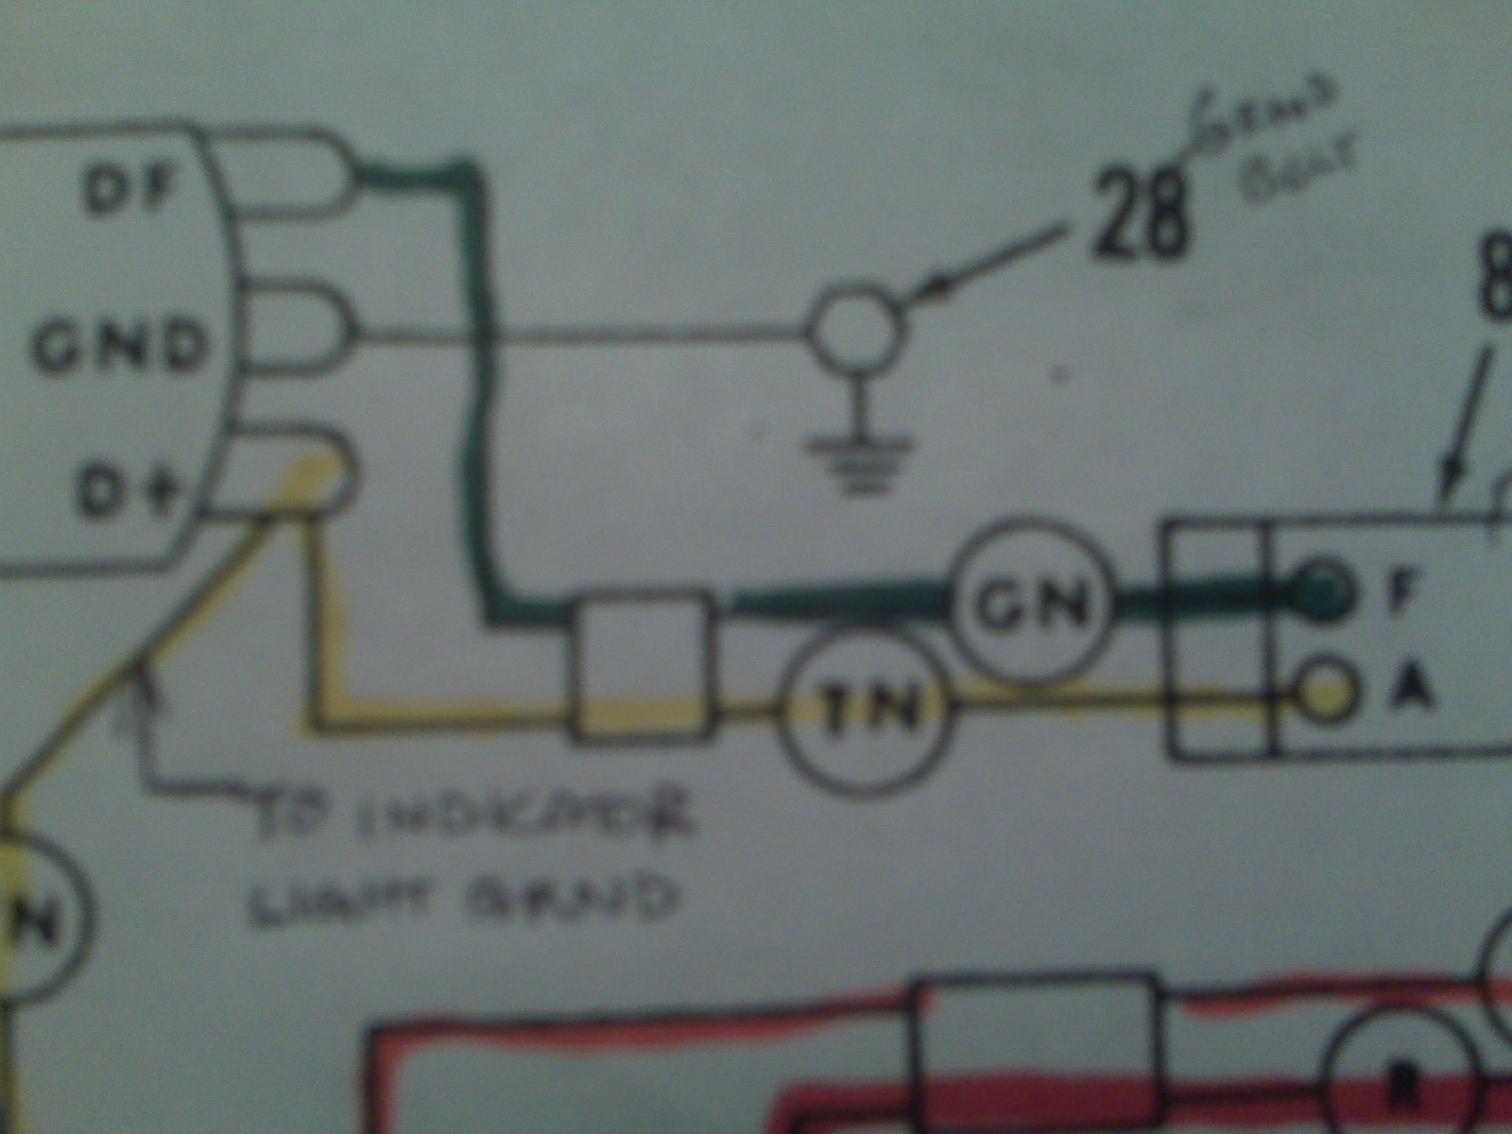 2007 fxst wiring diagram pioneer deh 1800 harley best library davidson road king 73 charging system problem genlghttst3 jpg